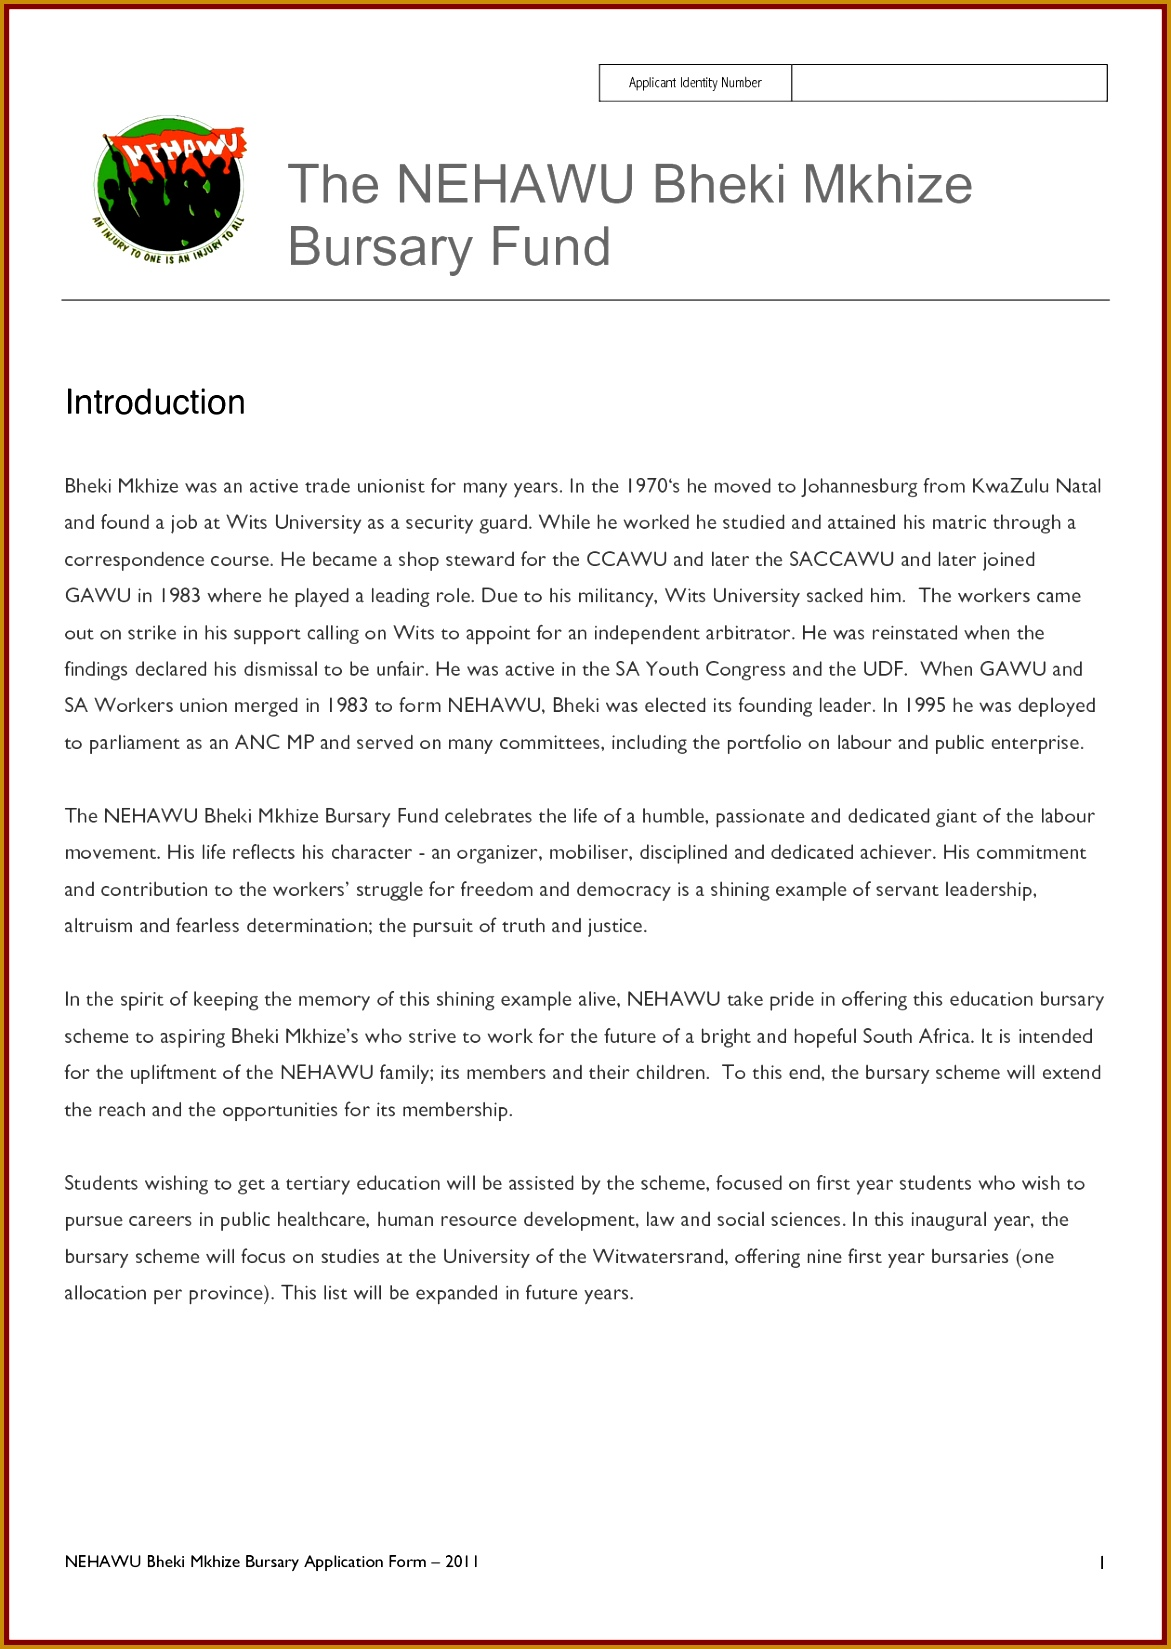 Bheki Mkhize Bursary Fund The NEHAWU Bheki Mkhize Bursary Fund by 11711649